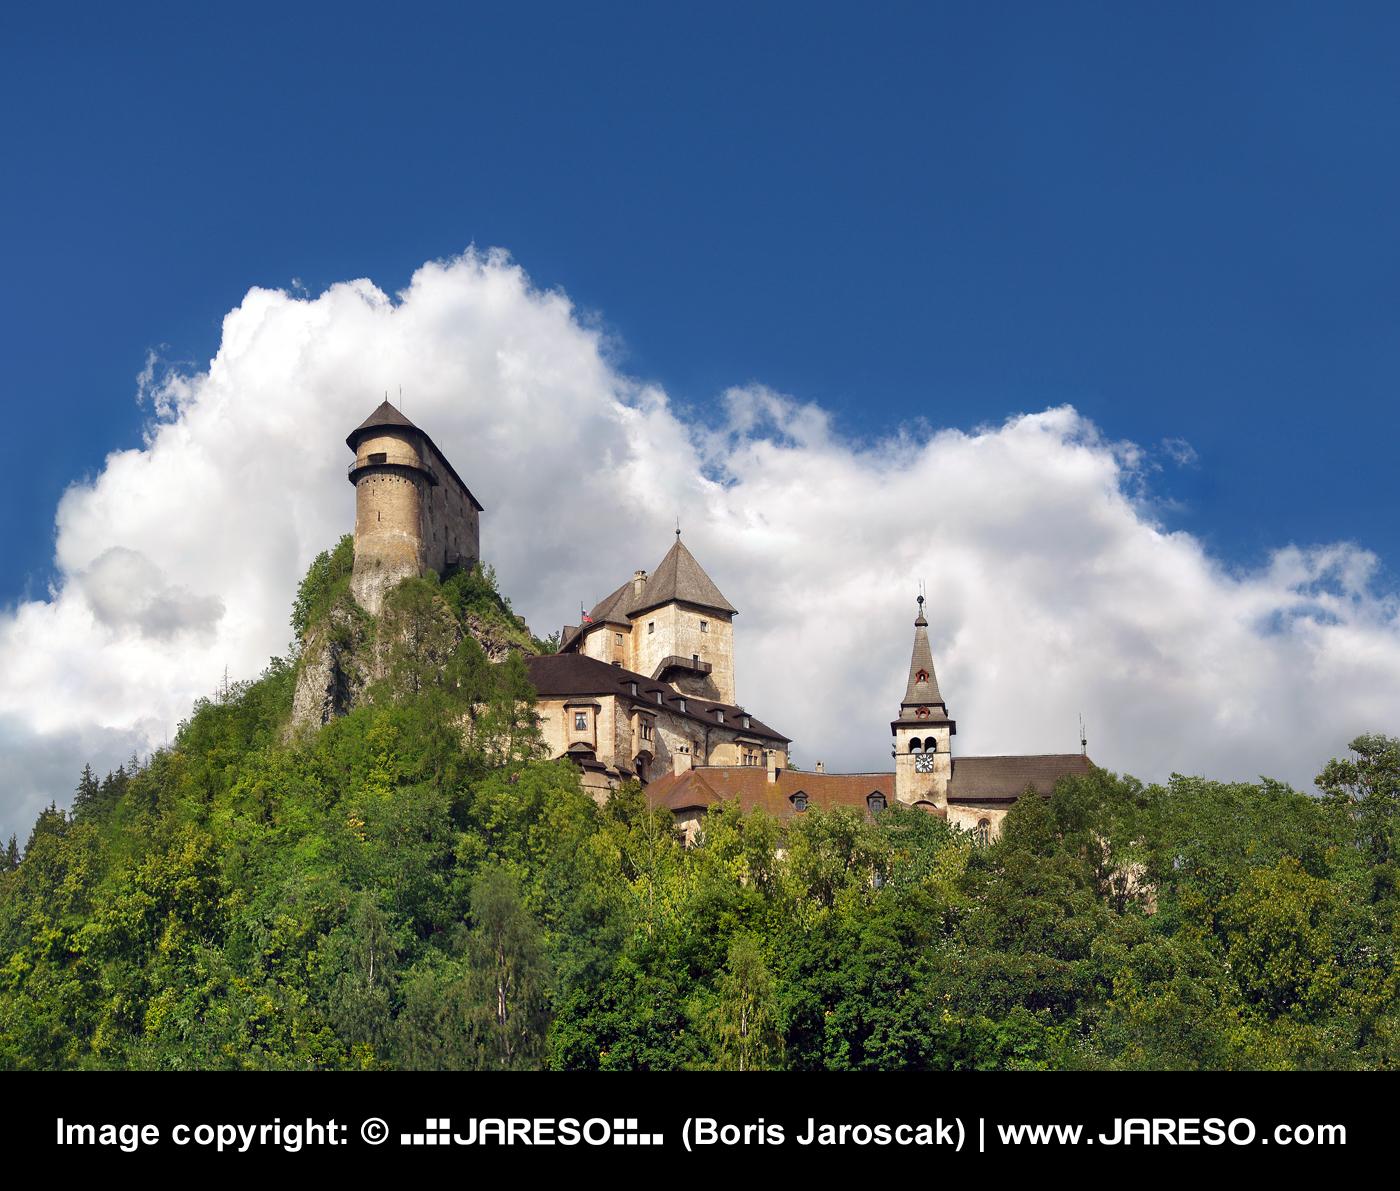 web_gplus_fb_panorama_castle_orava_summer_cloudy_p7267016_p7267020_p7267021_b.jpg